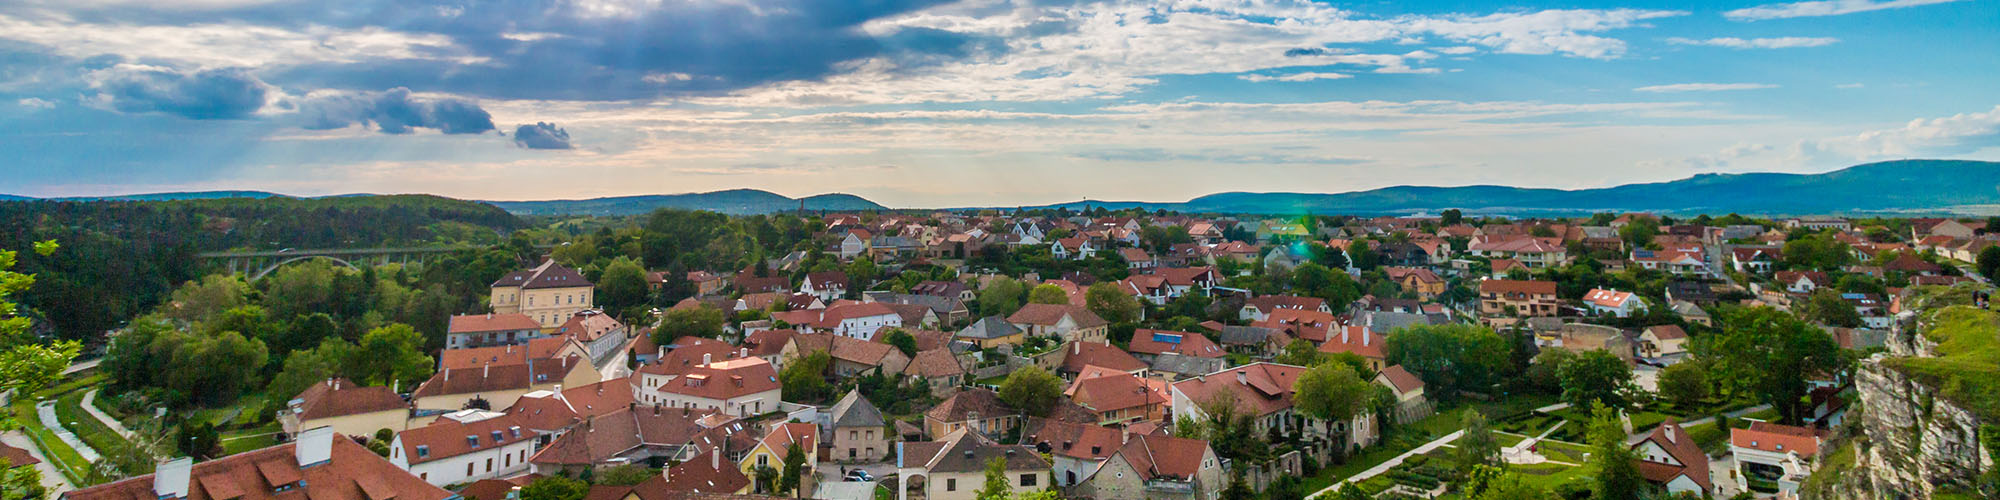 Immobilien in Herne und Umgebung